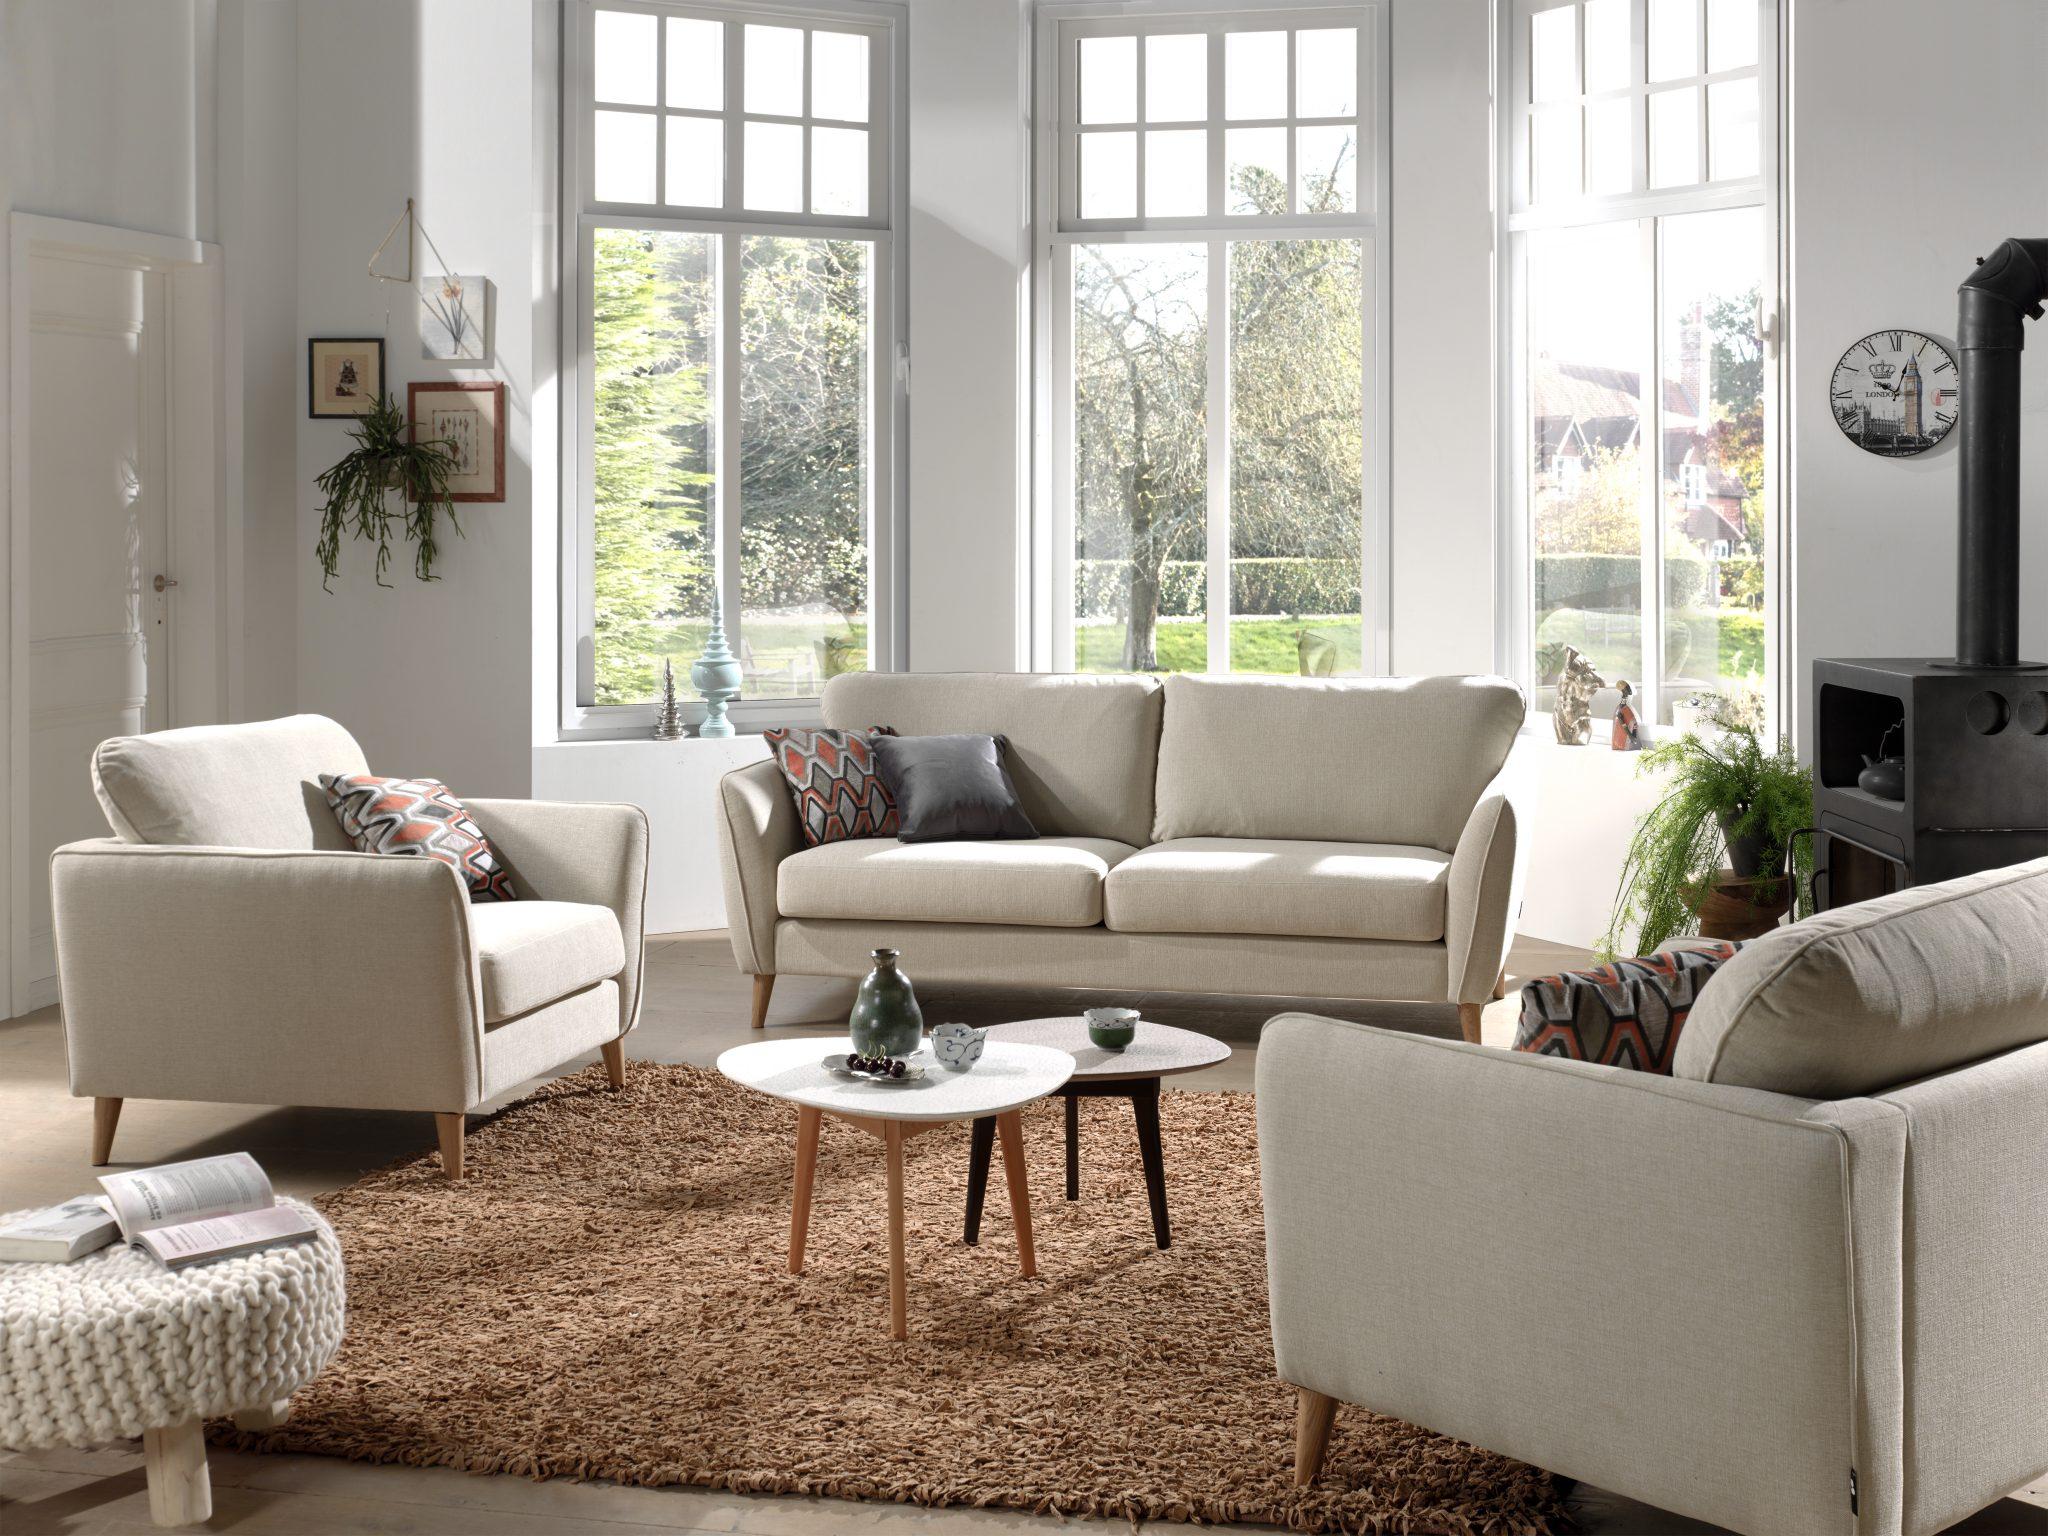 Harlow 311 Luiza 8 Beige FR1 (high Rez) Softnord Soft Nord Scandinavian  Style Furniture